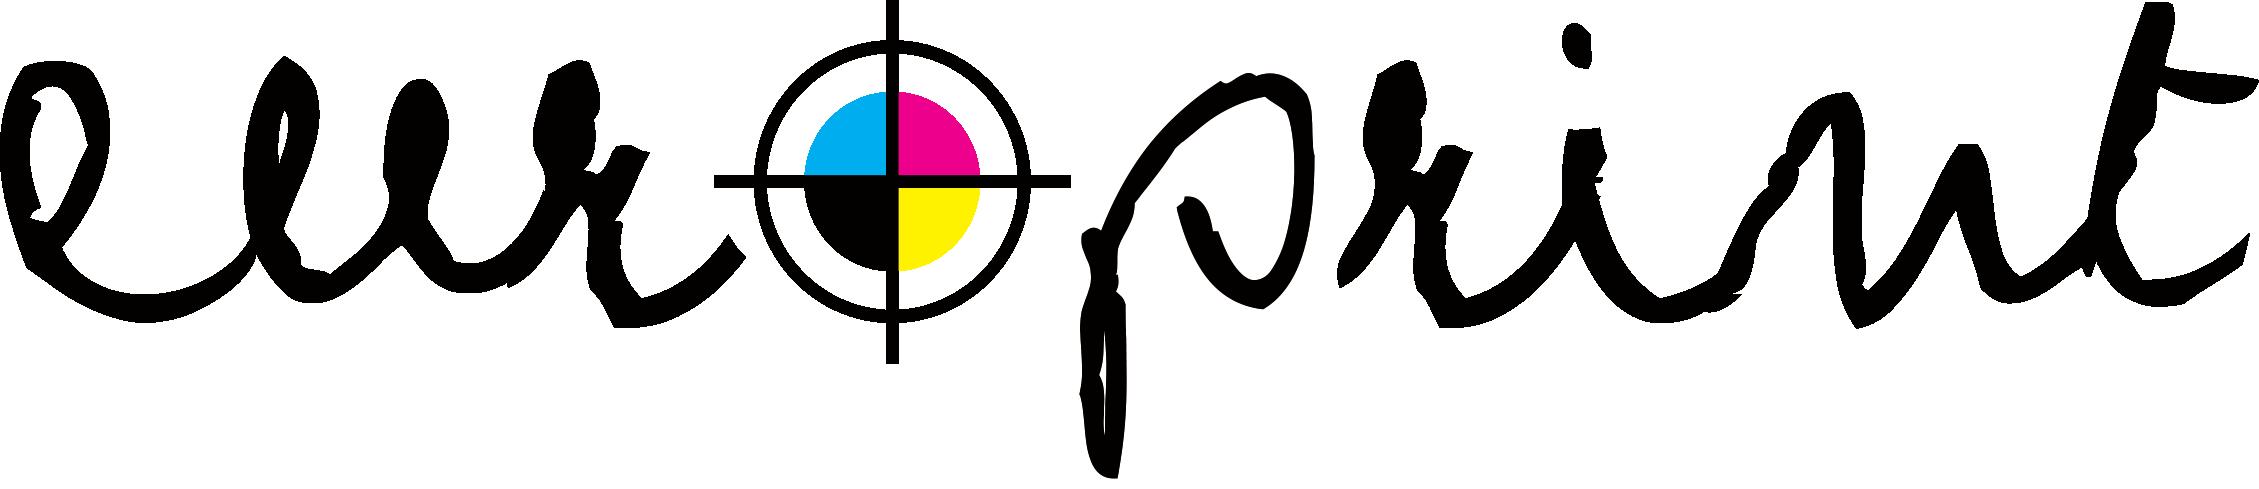 Europrint Snc - Alba Cuneo